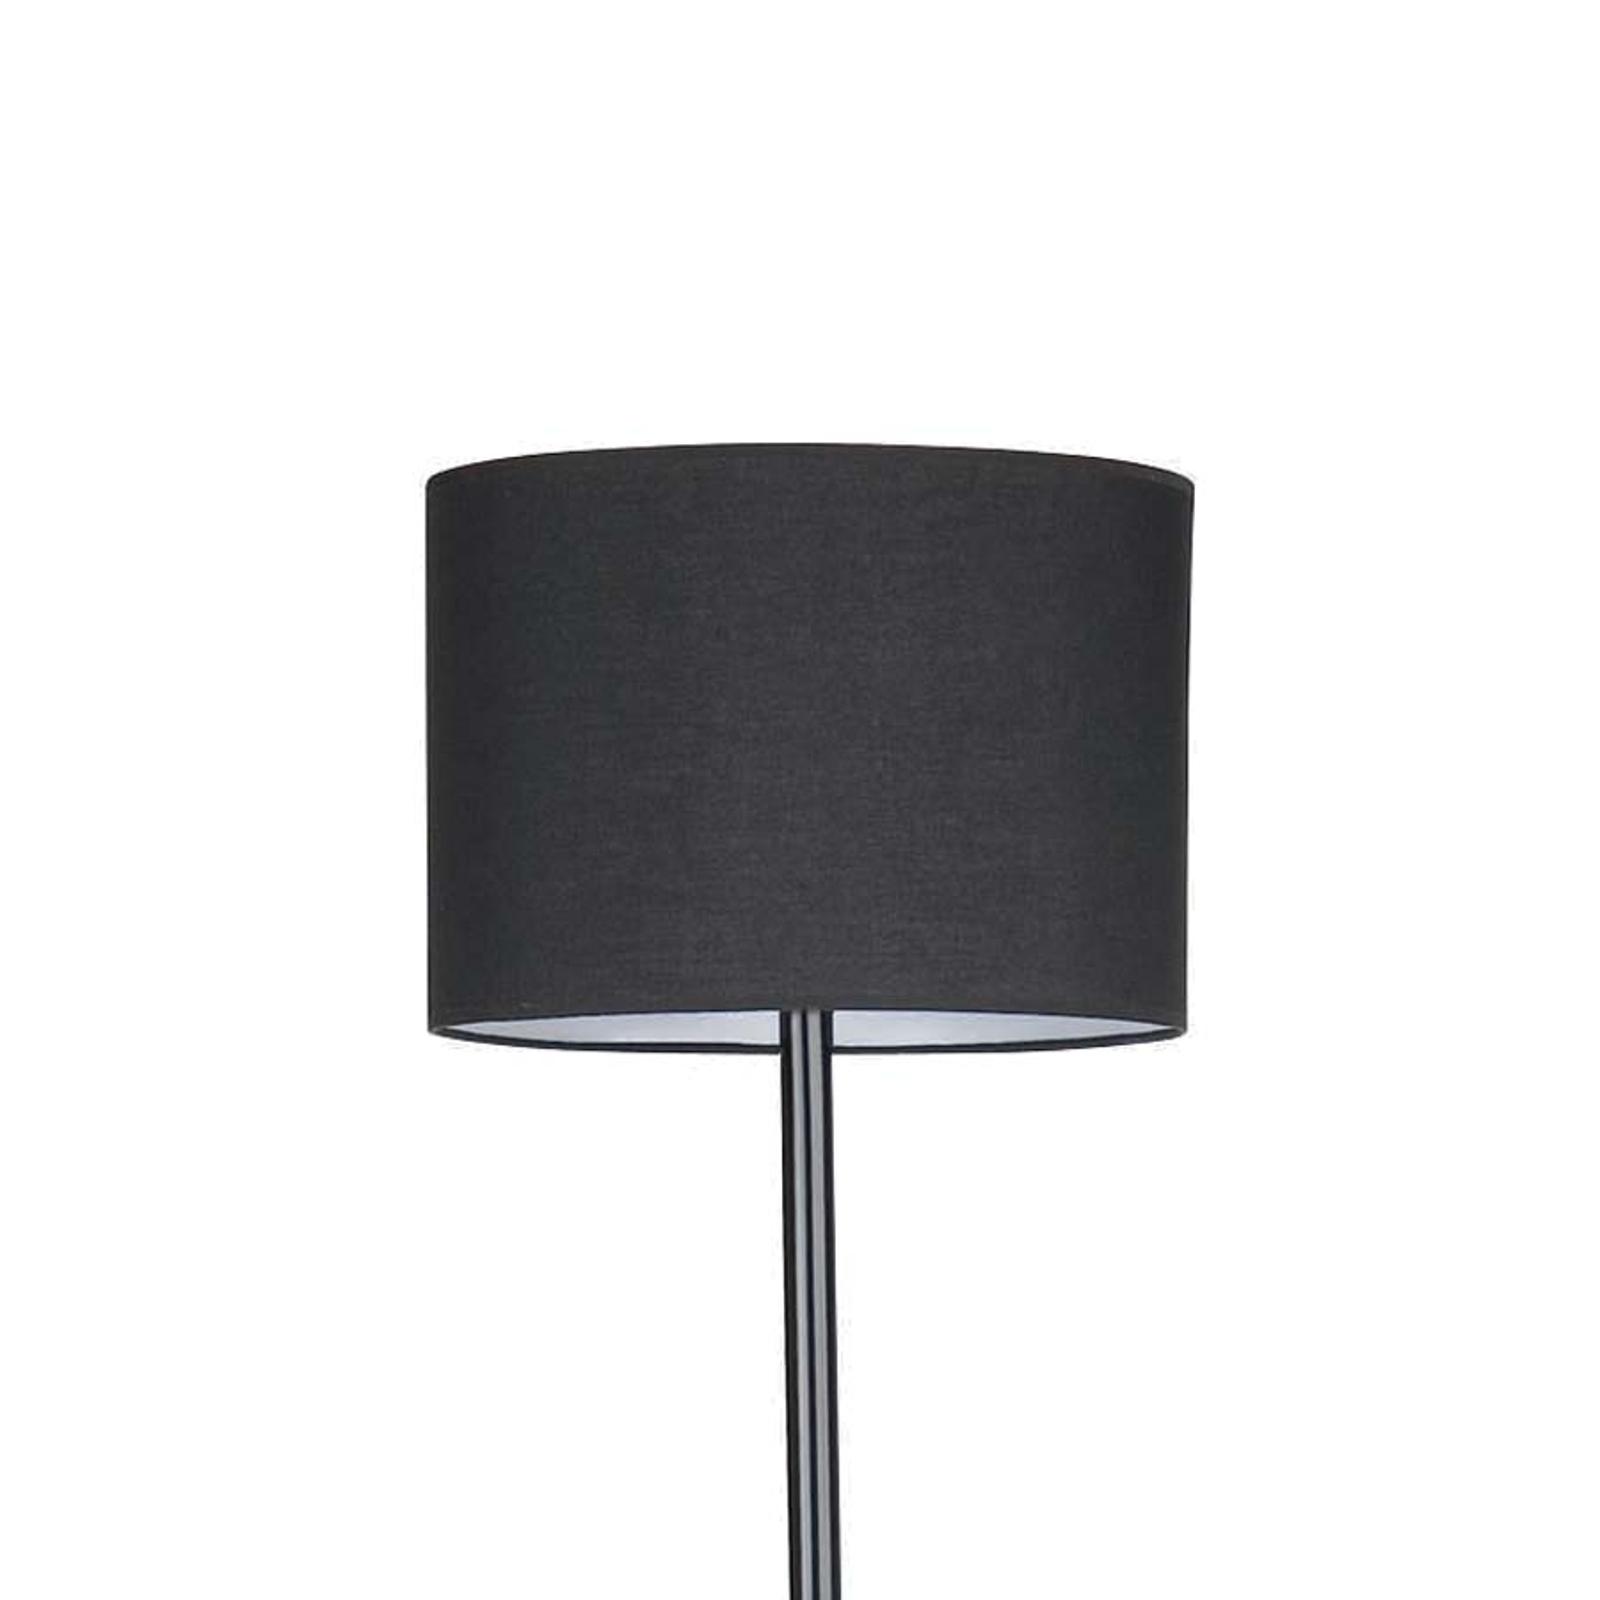 Imposante vloerlamp Black